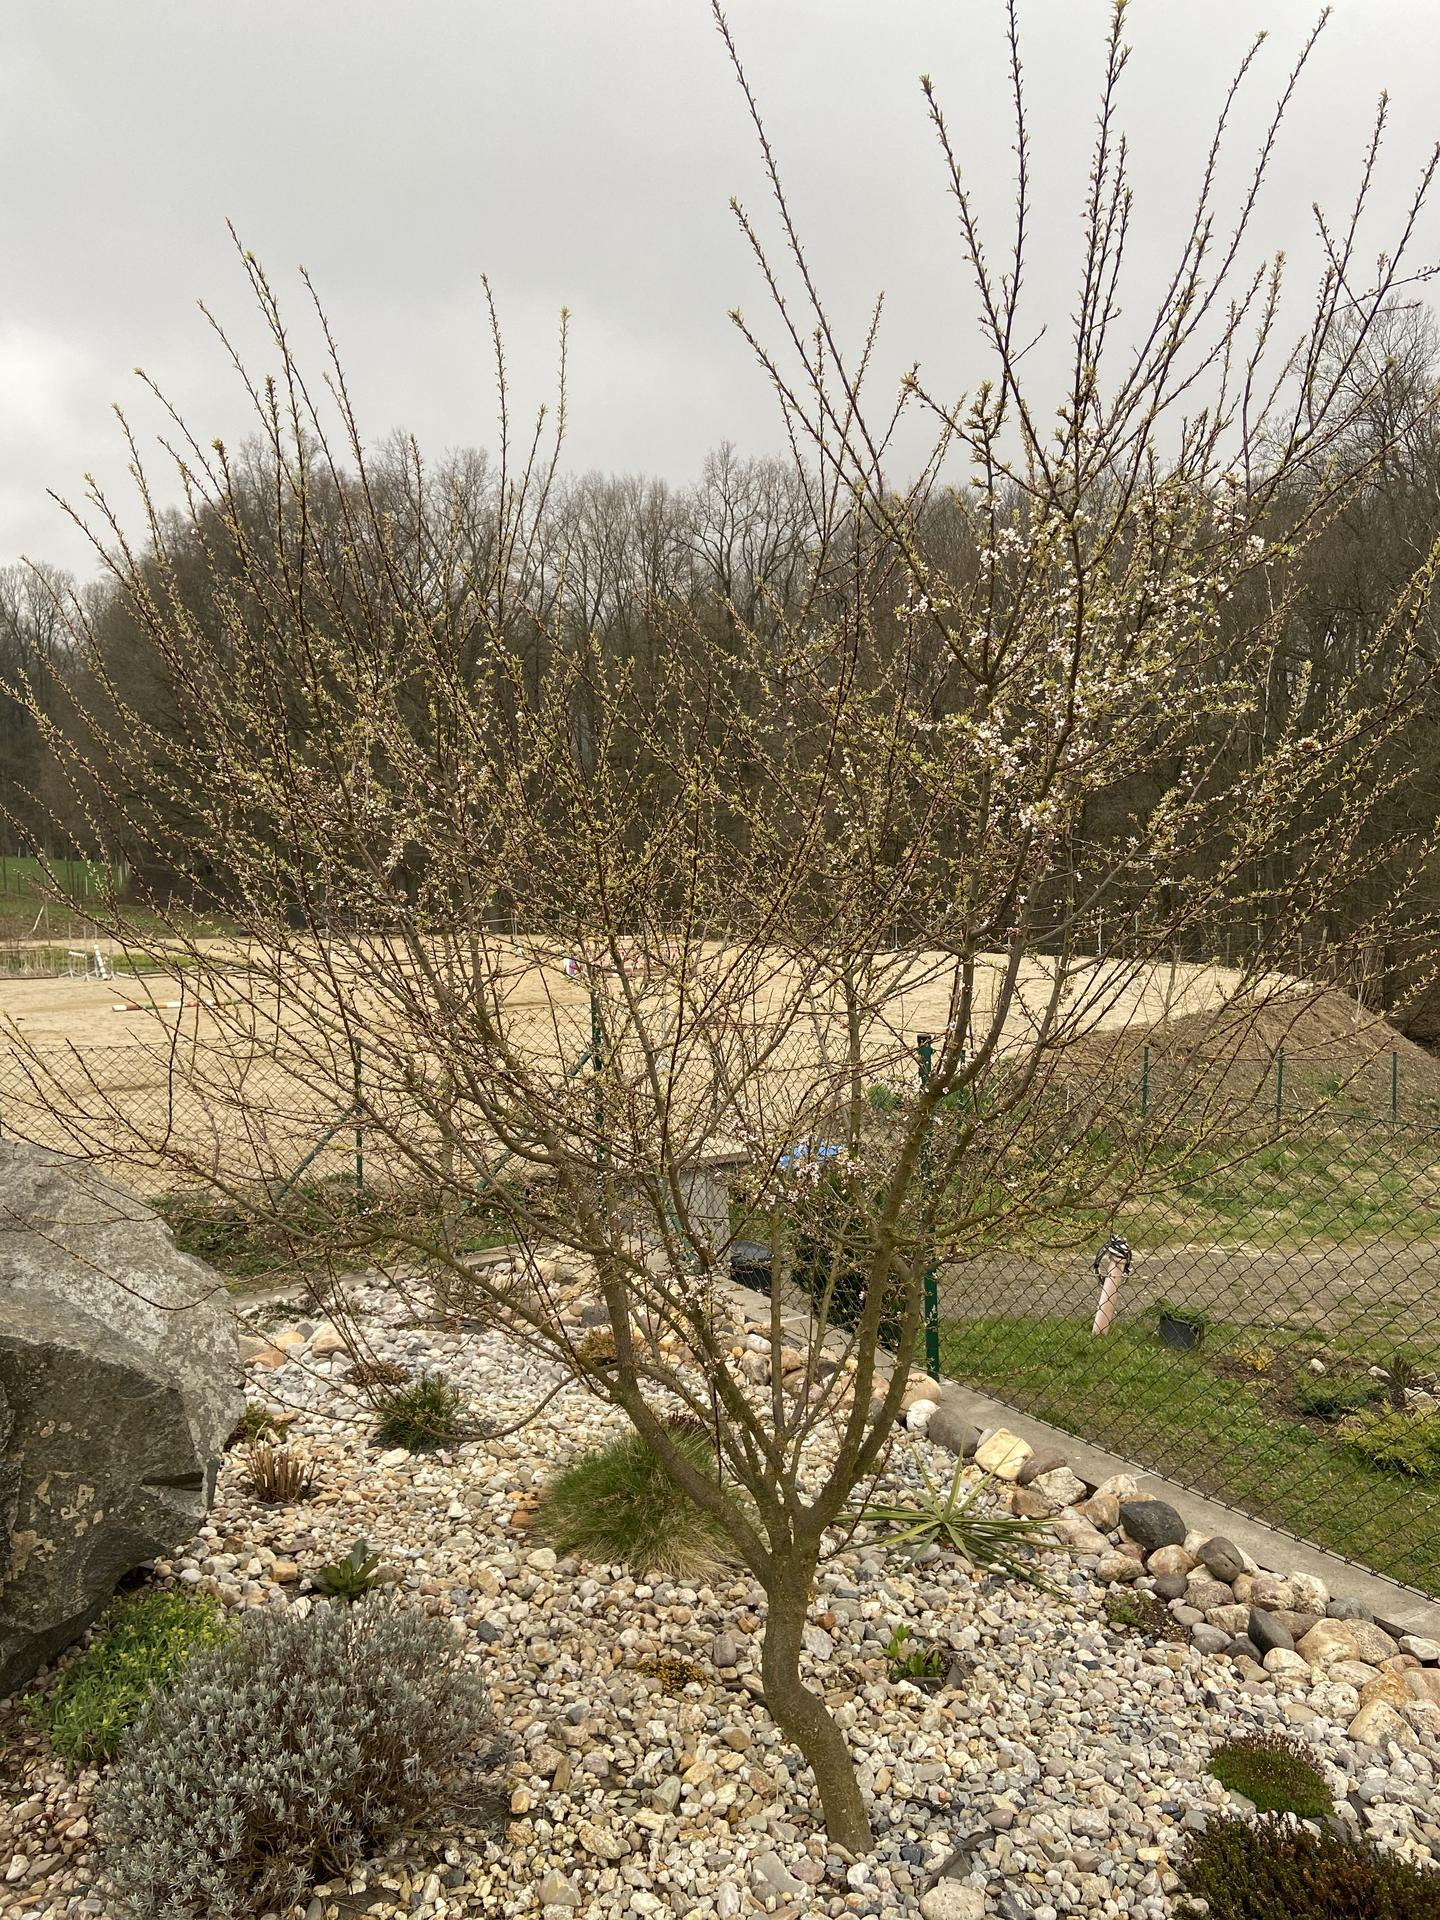 Pergola + zimní zahrada + zahrada - Tak to je náš líbací strom